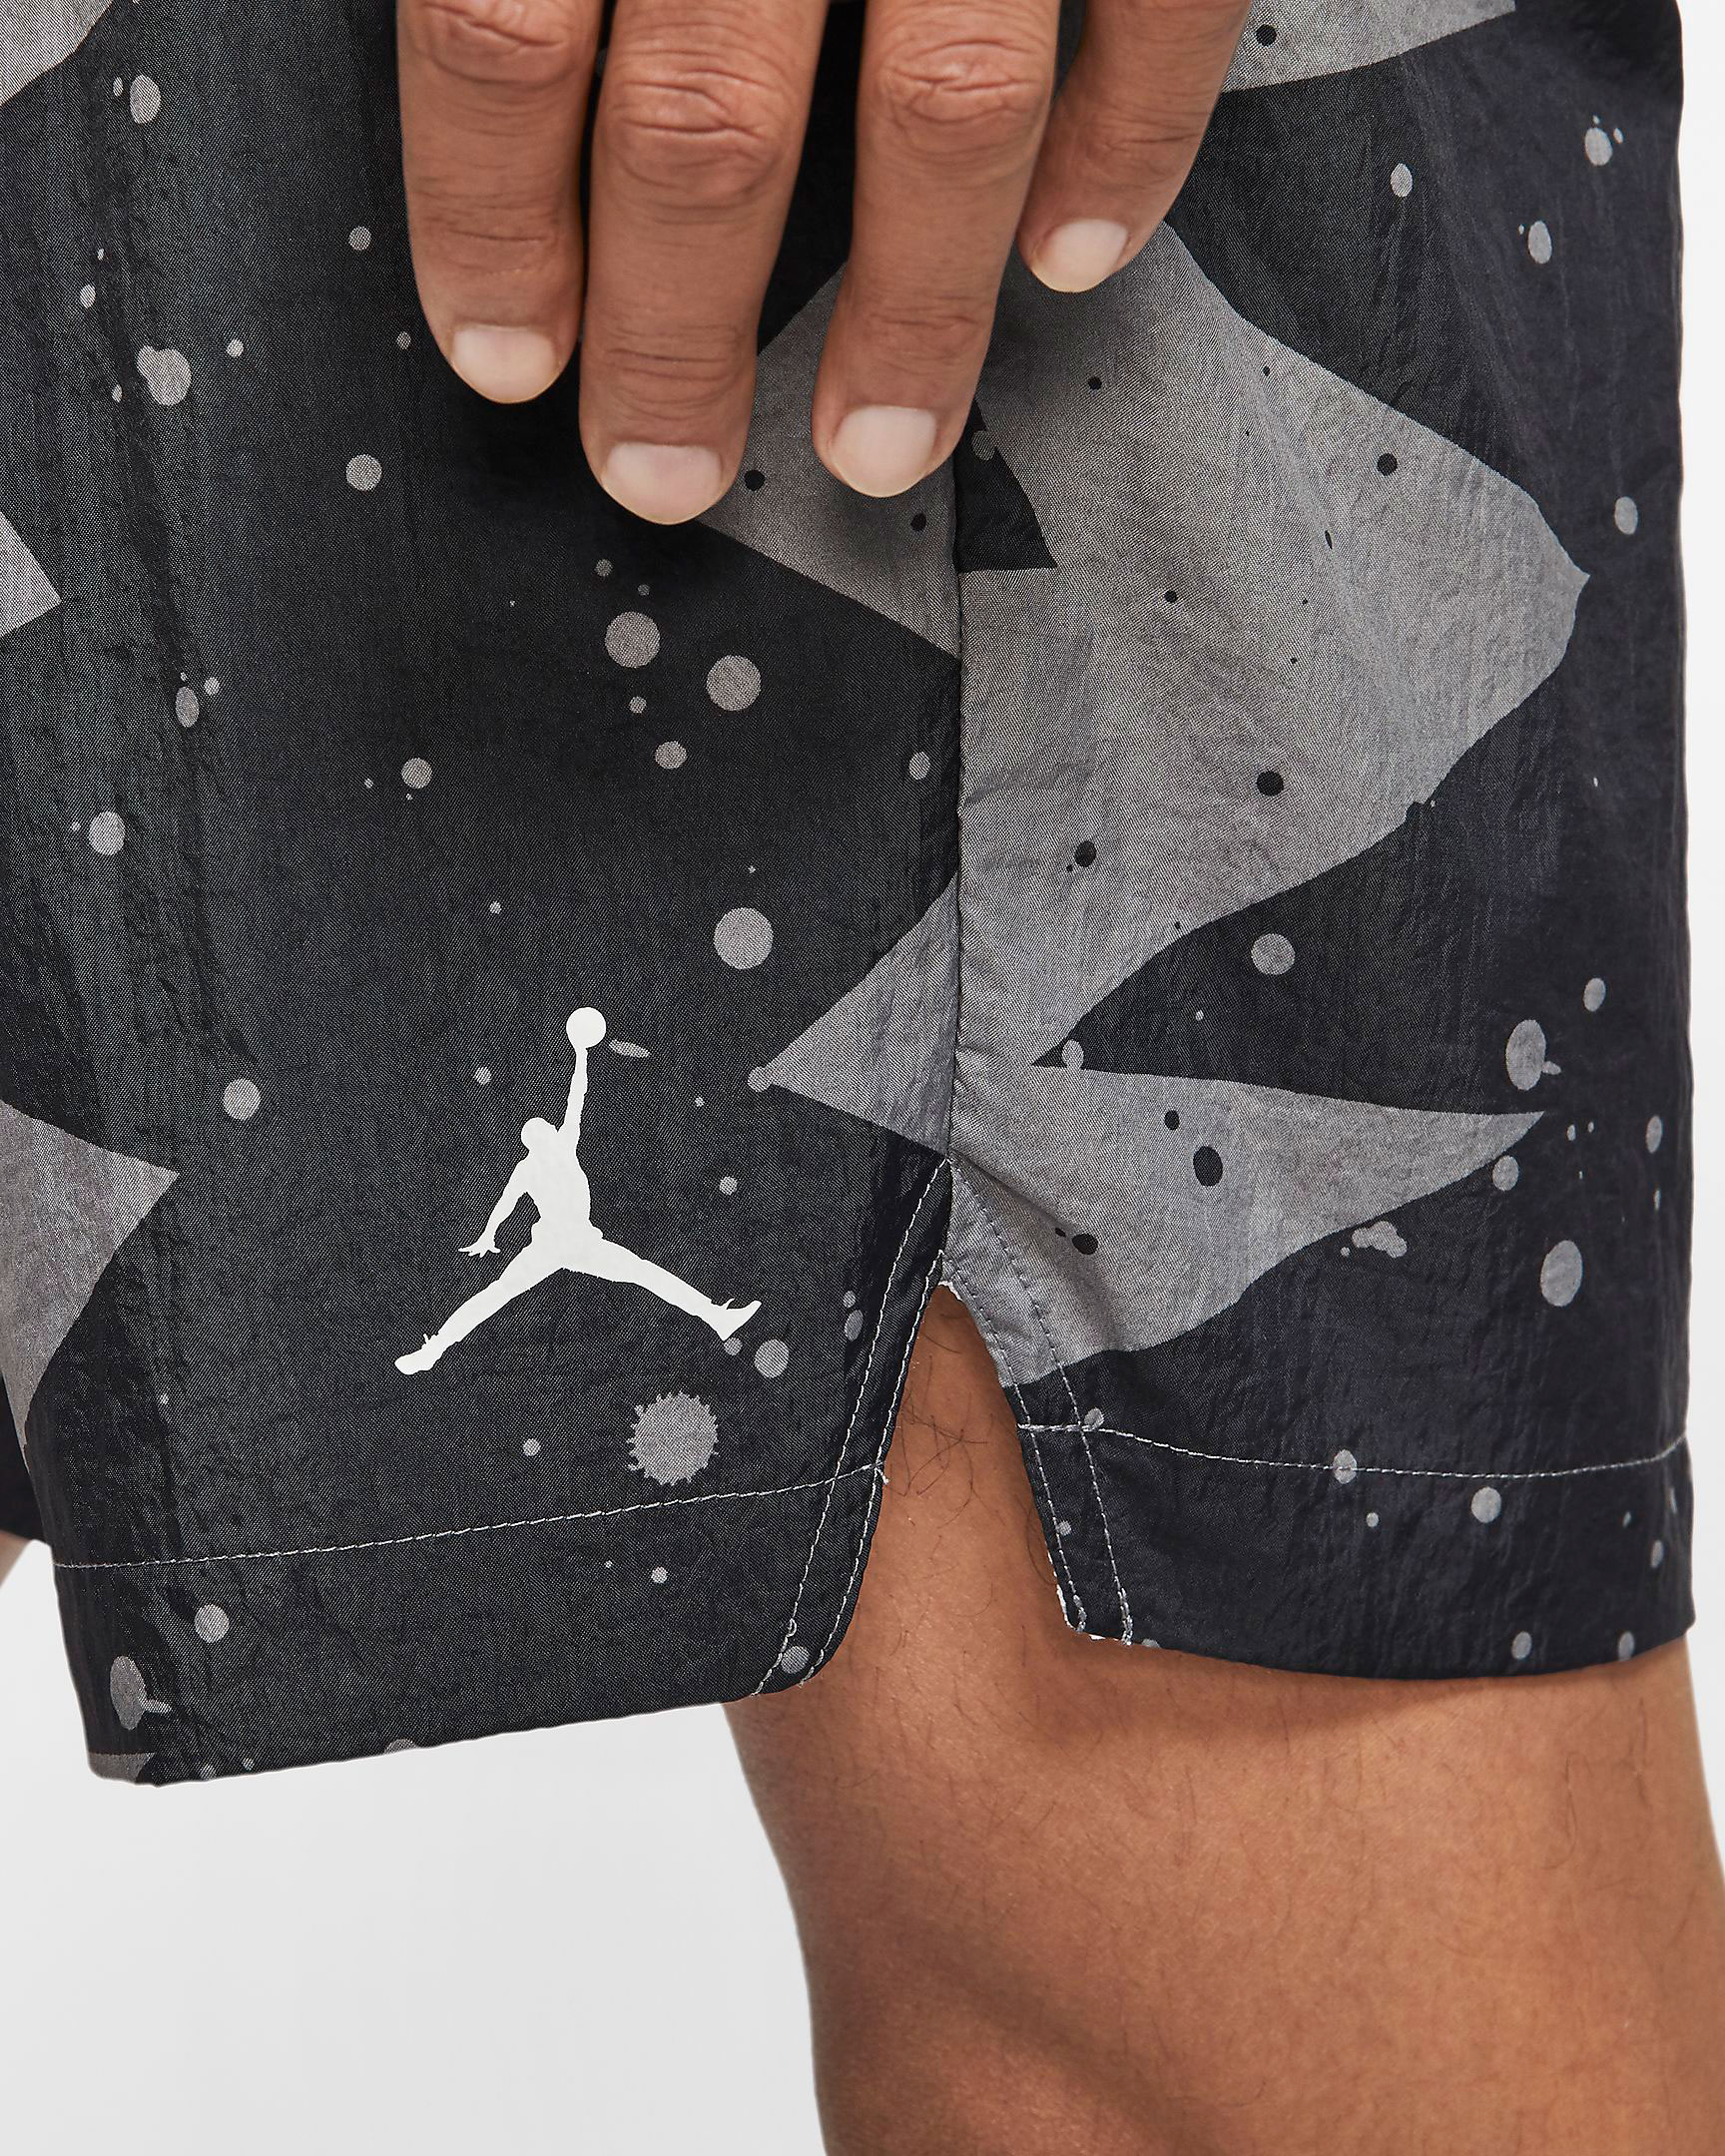 jordan-13-flint-poolside-shorts-2